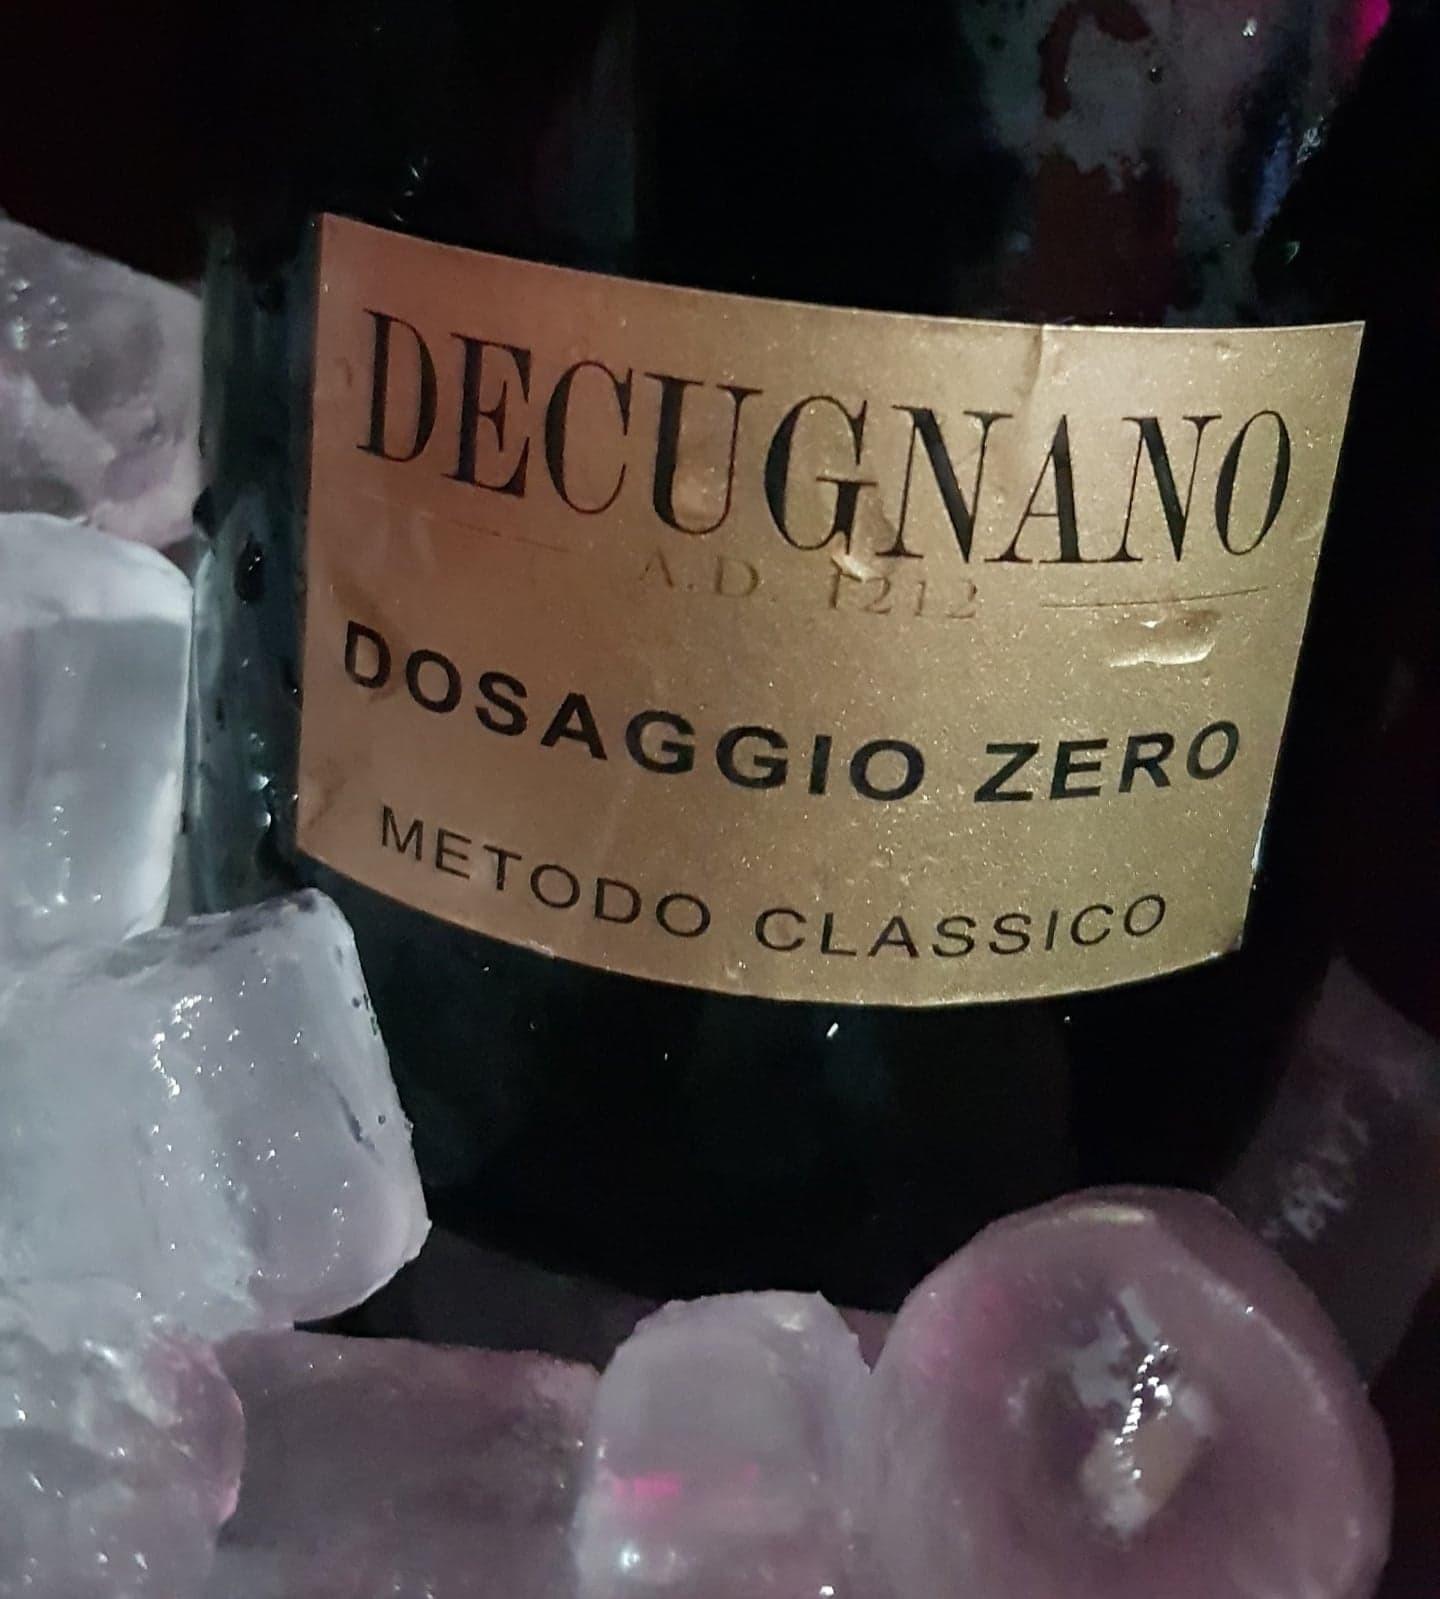 Only Wine Festival - Decugnano